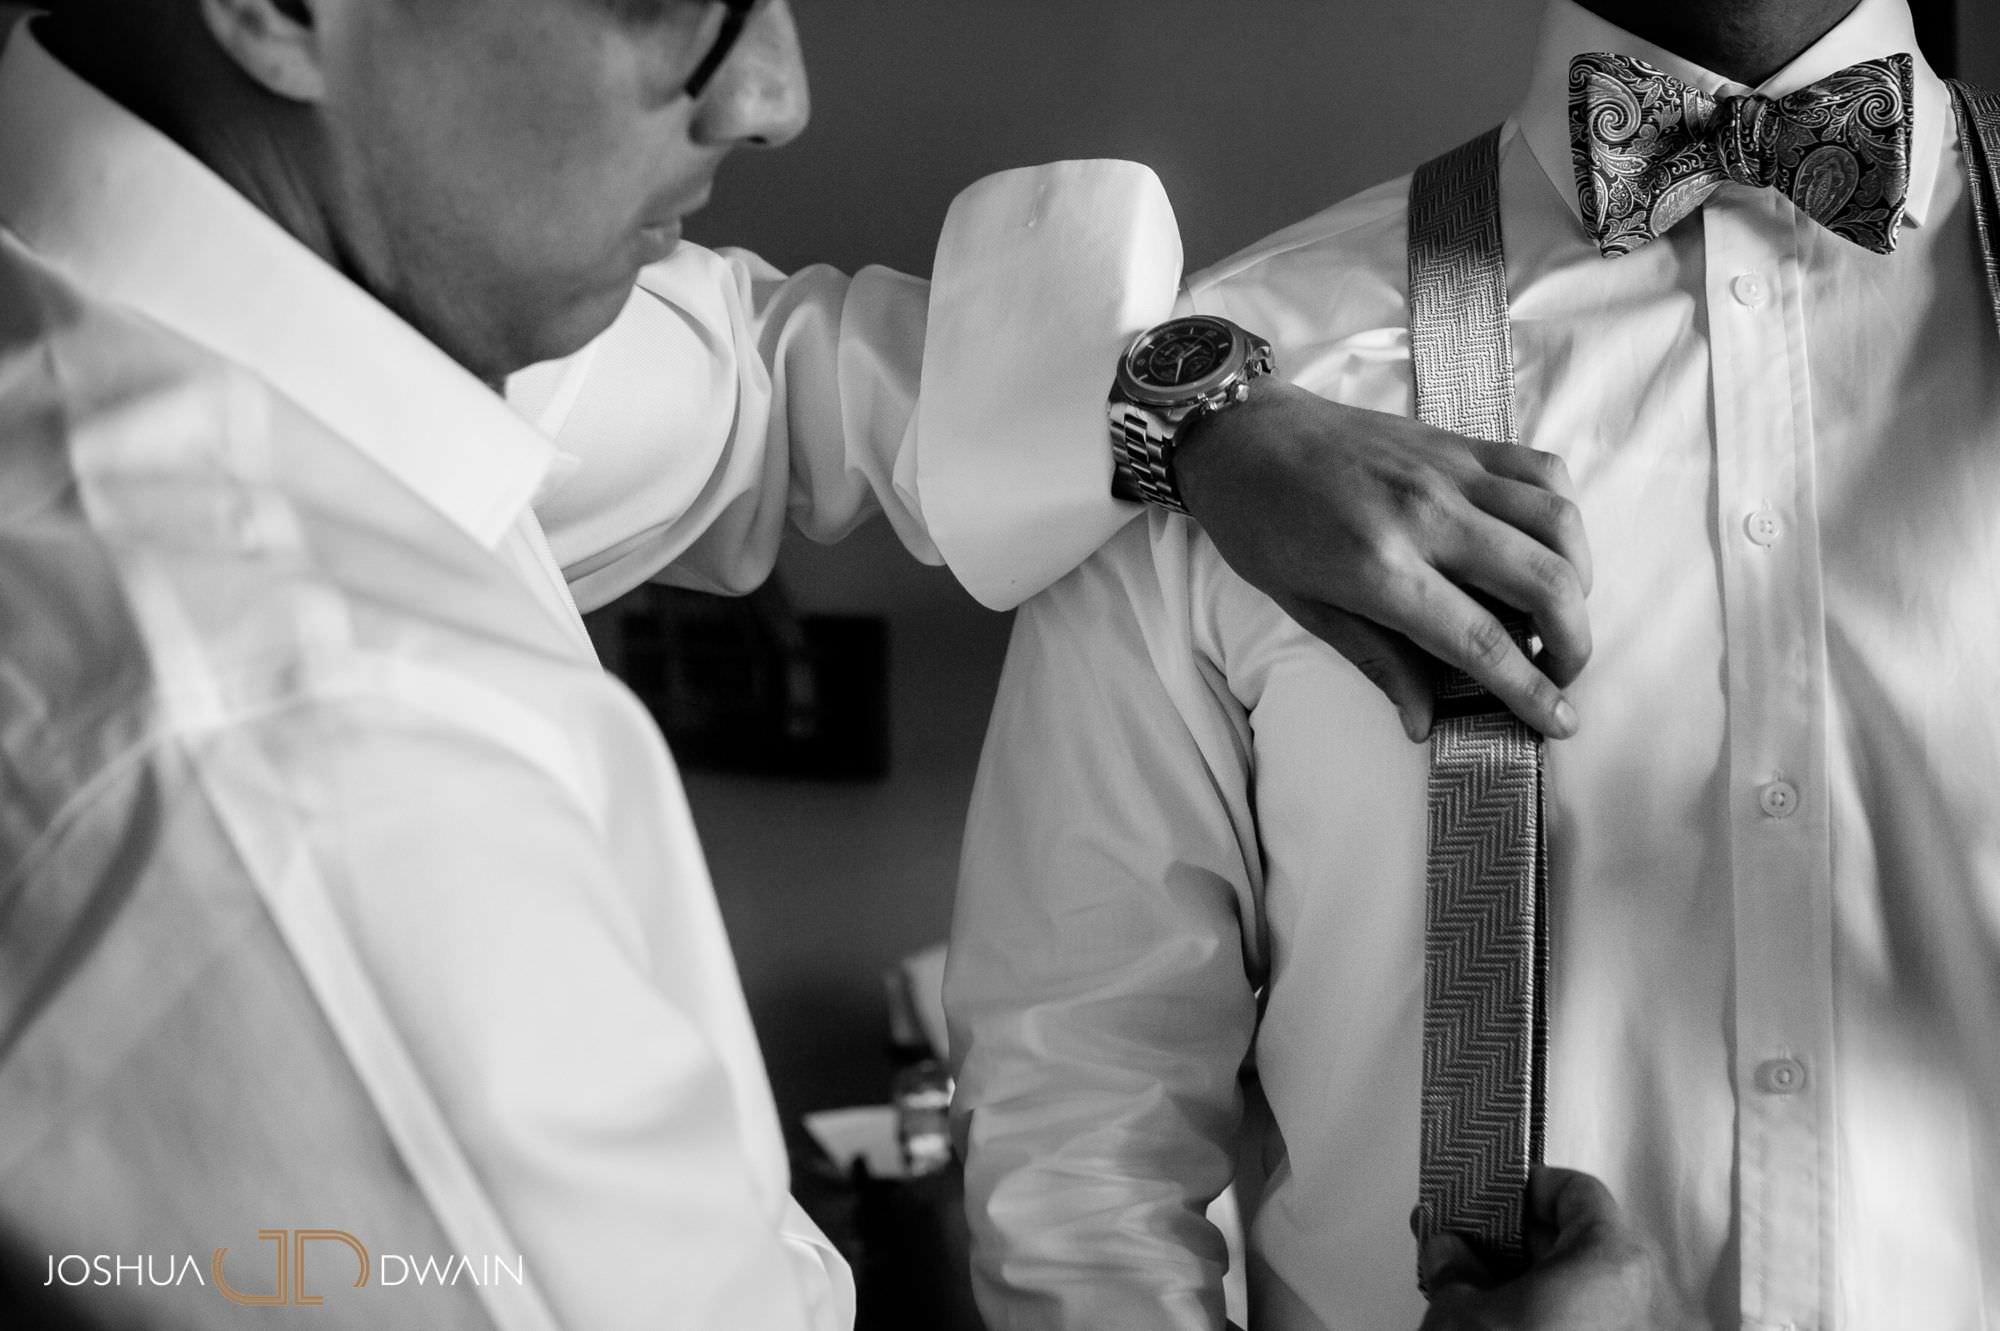 nicole-mauricio-005-tosca-marquee-bronx-ny-wedding-photographer-joshua-dwain